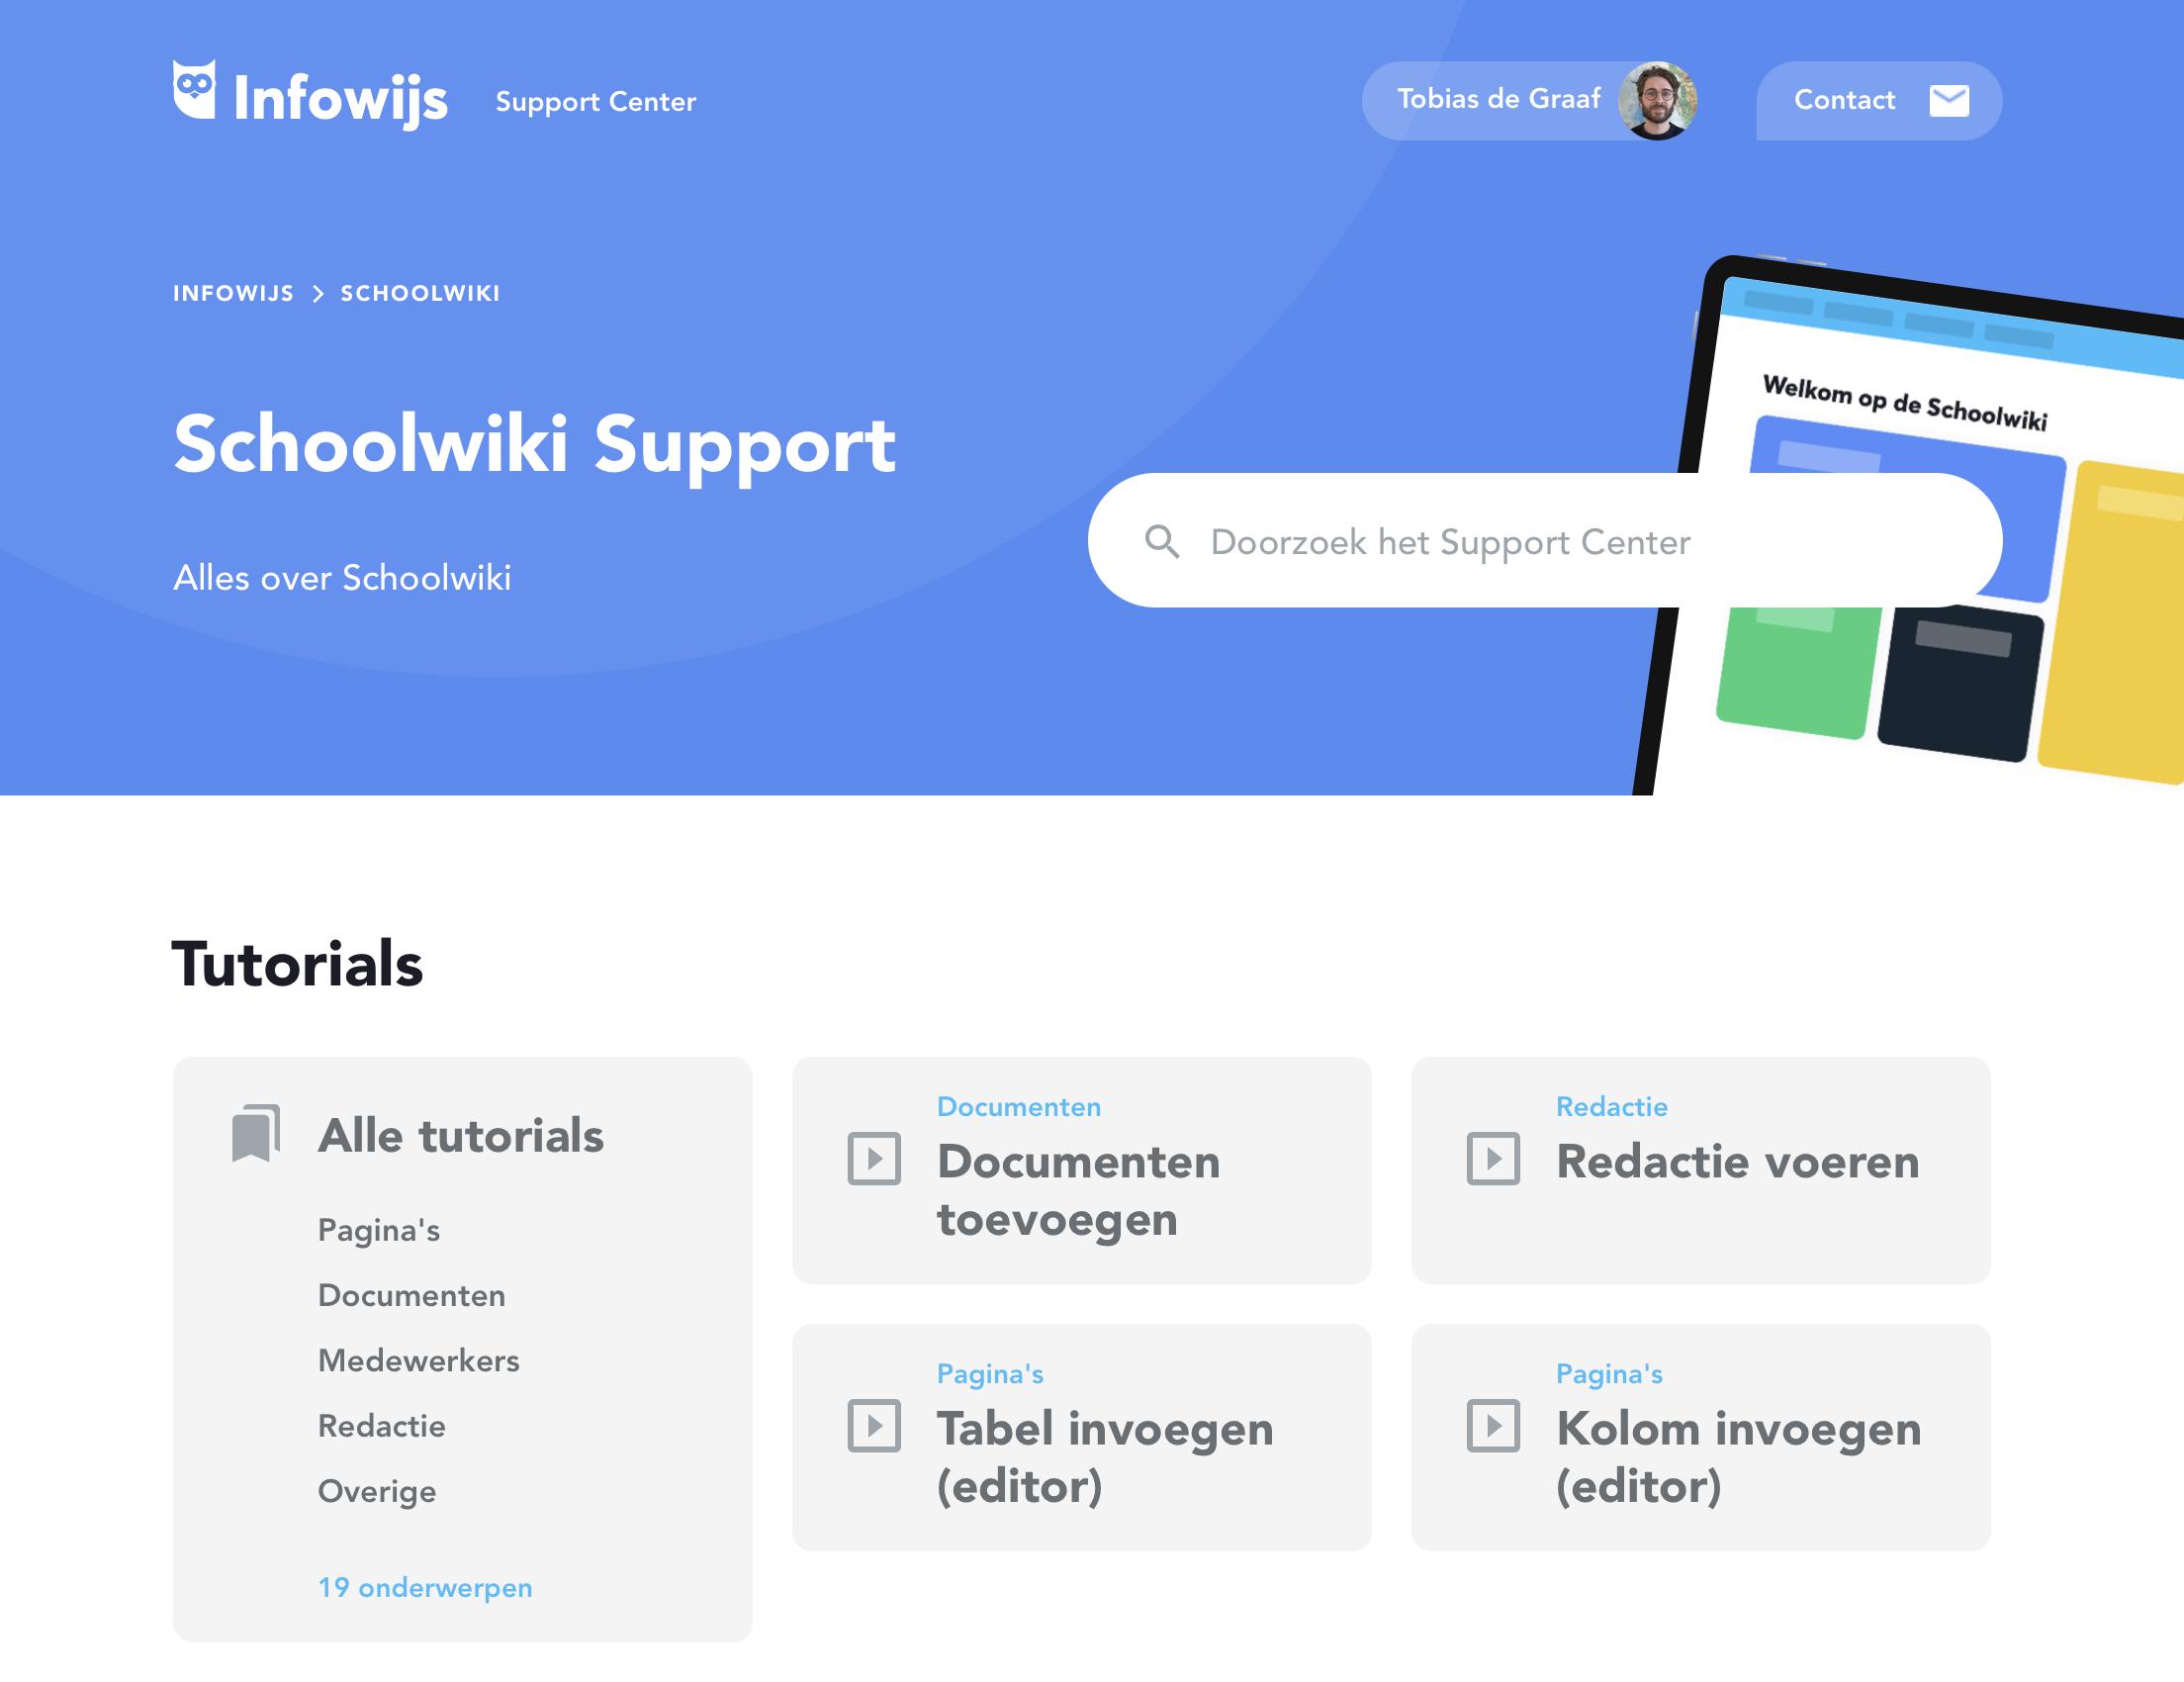 Schoolwiki support